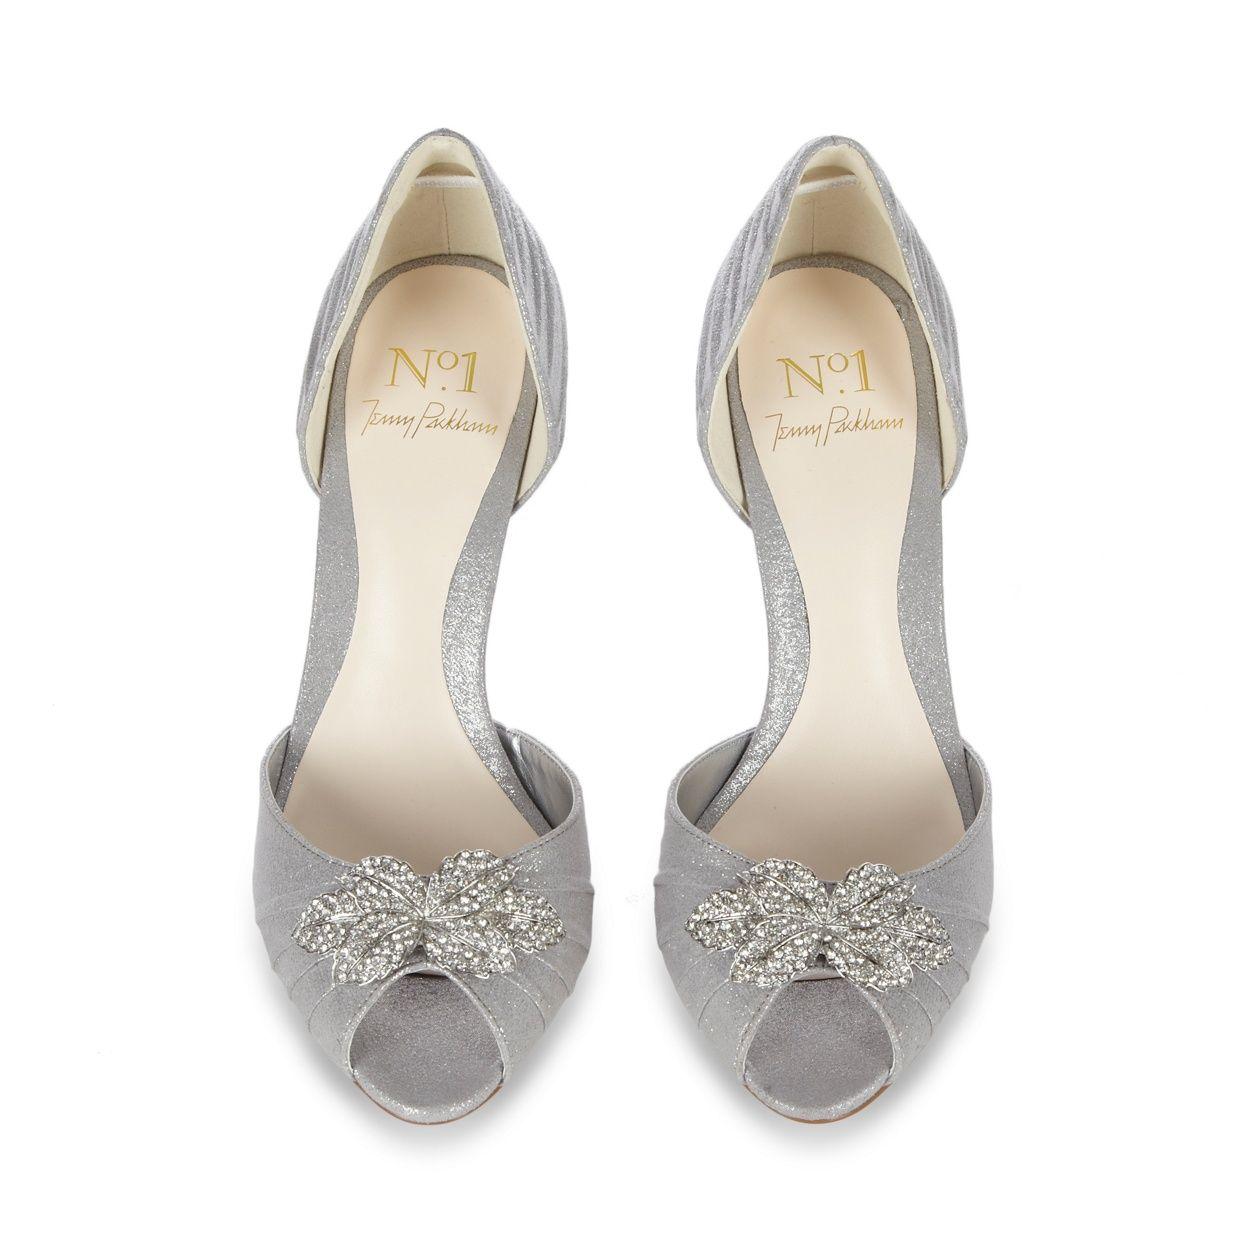 High heel shoe boots, Bridal shoes